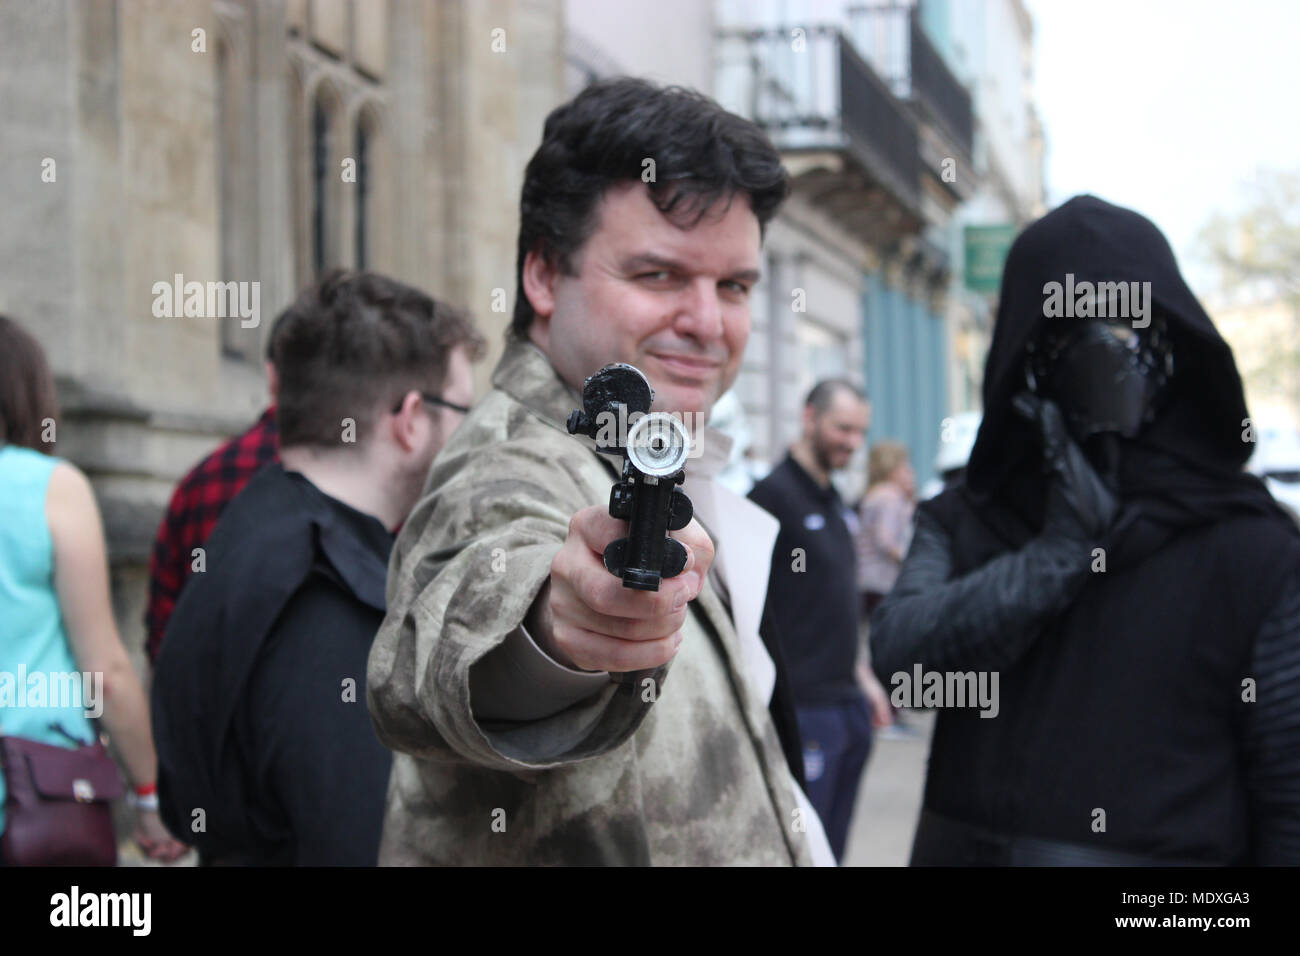 Oxford, UK. 21st April 2018. Cosplayers attend Comic Con, Oxcon III, Oxford, UK, Saturday 21st April 2018, Rosanna Marie Saracino Credit: Rosanna Saracino/Alamy Live News - Stock Image